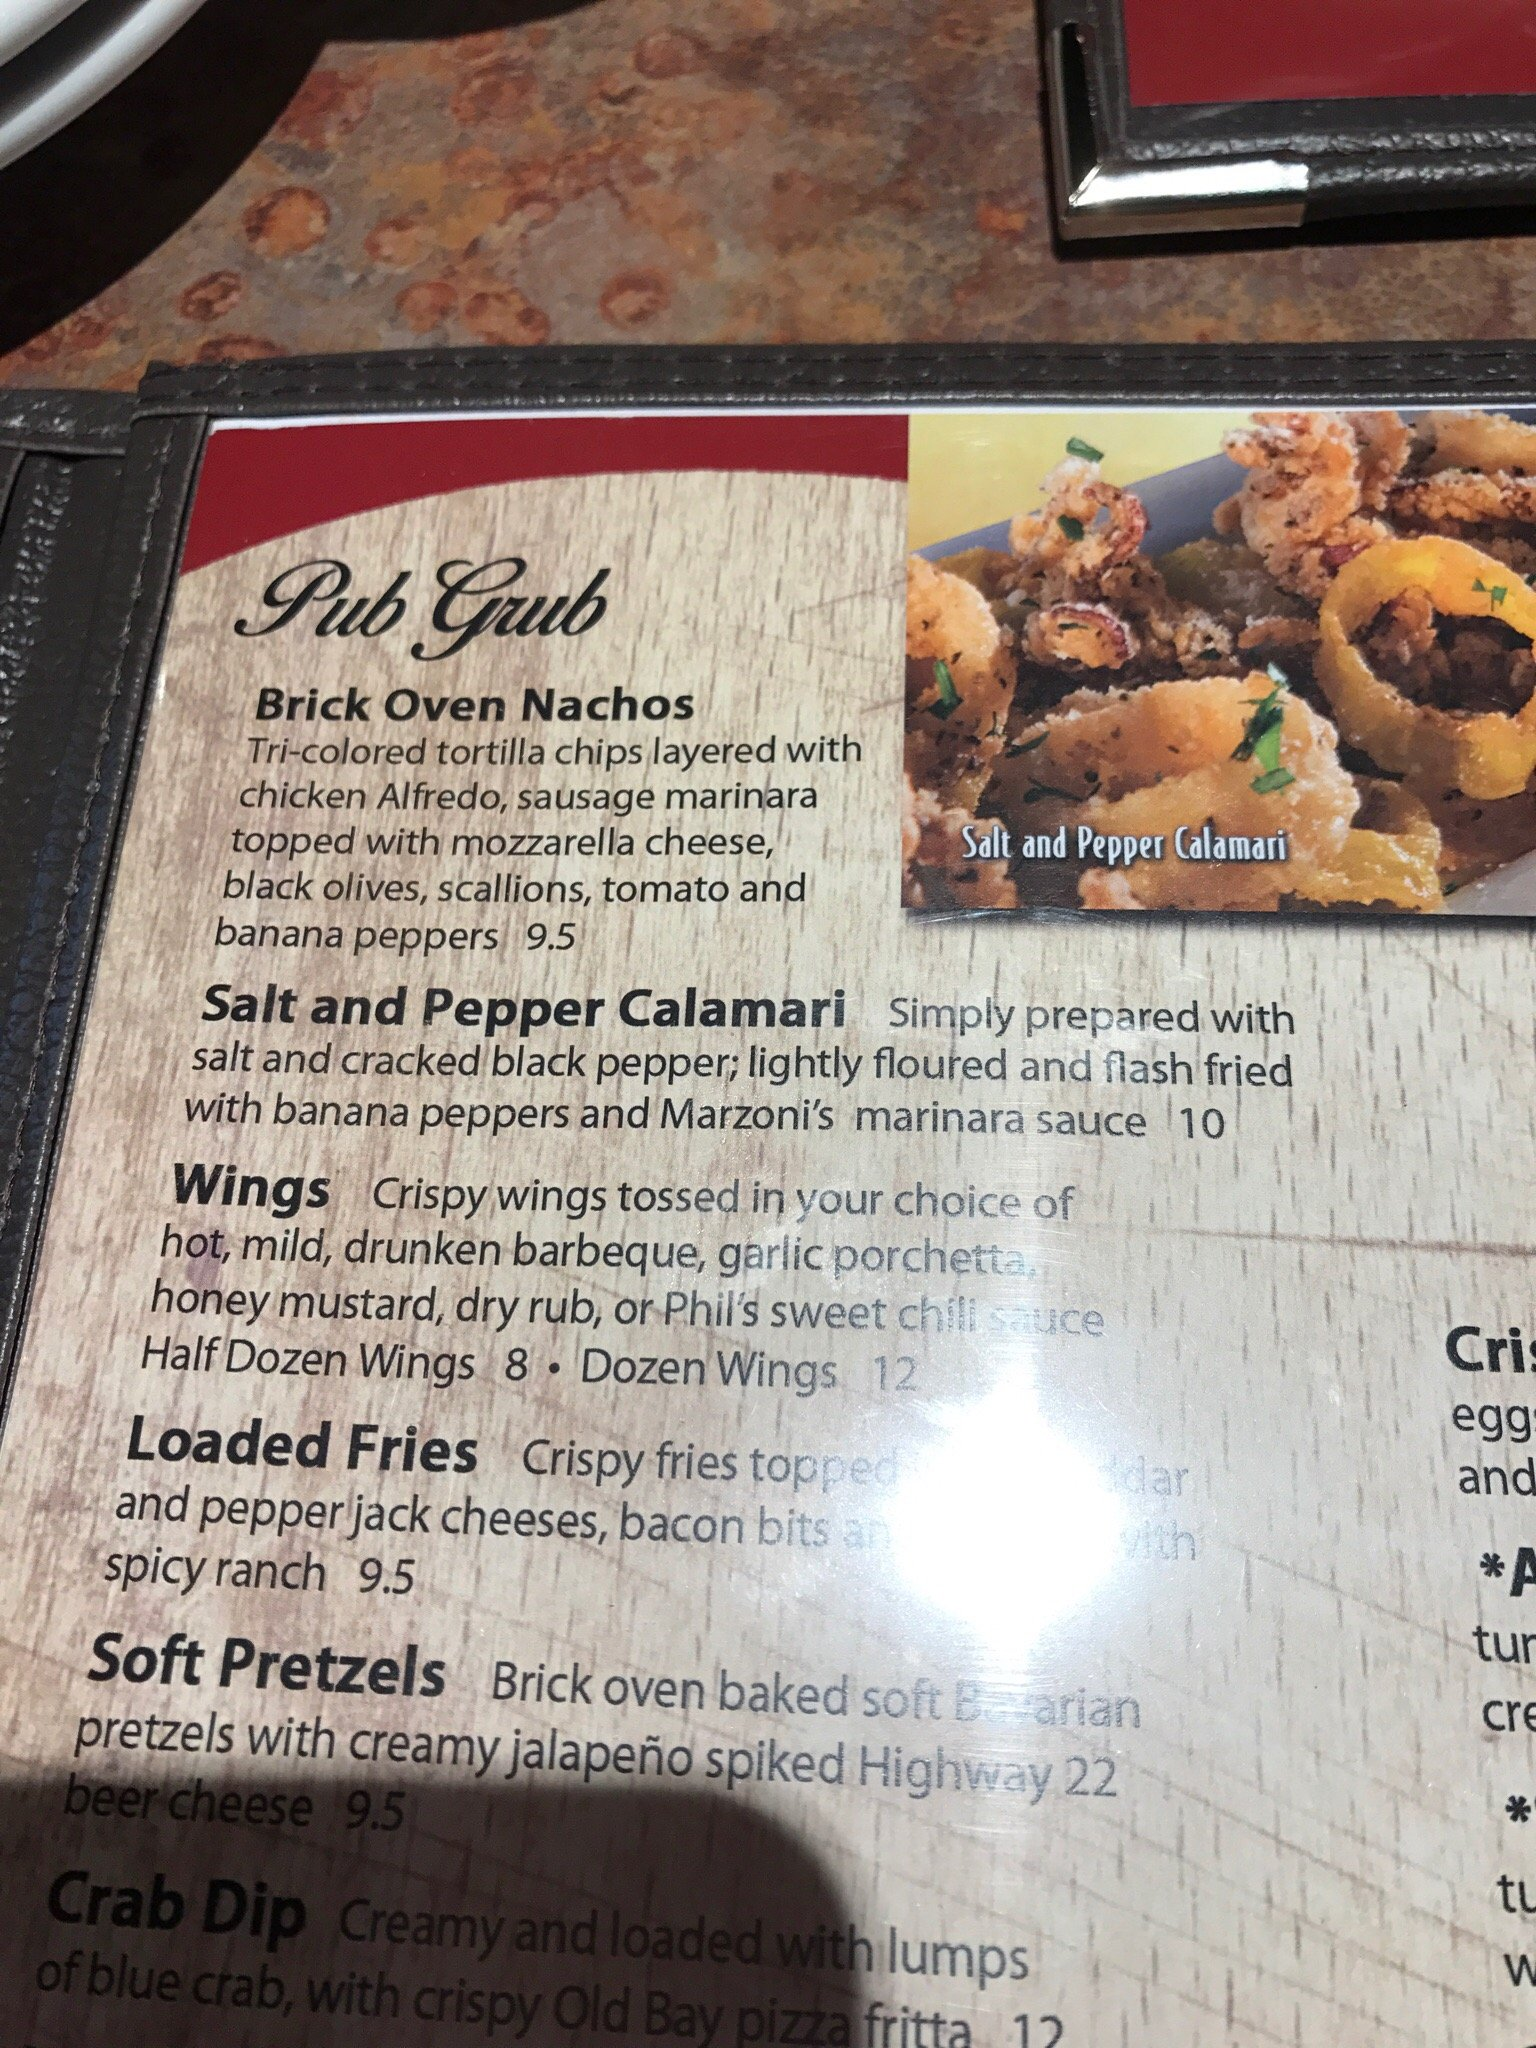 parts of the menu